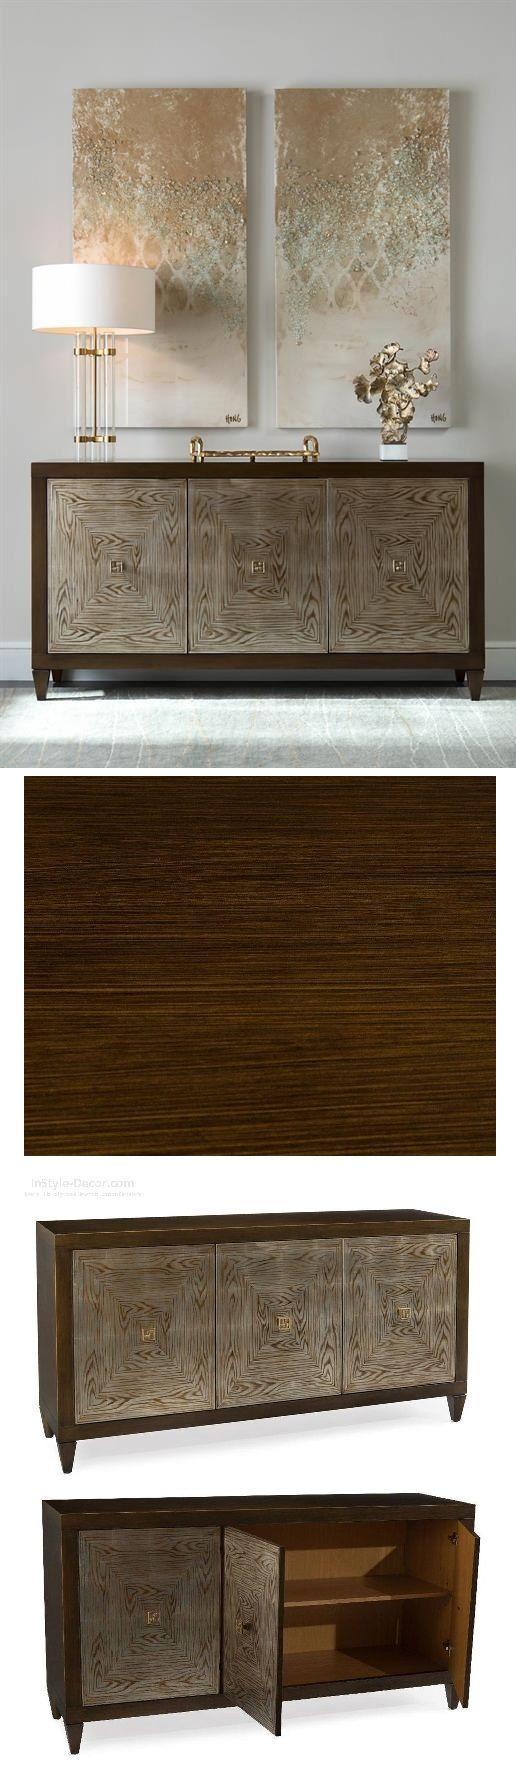 1000 ideas about modern hotel room on pinterest coat - Hilton furniture living room sets ...